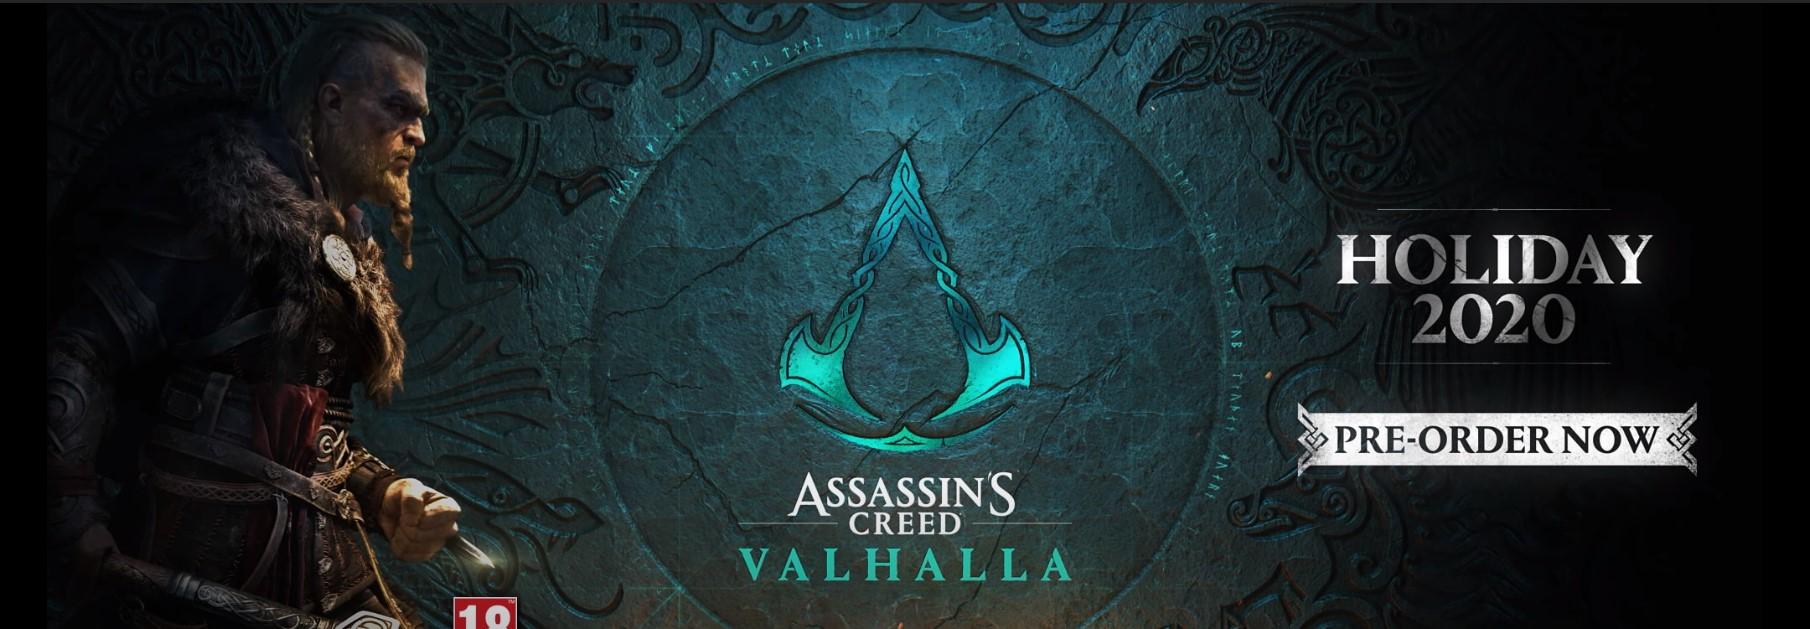 Assassin's Creed Valhalla Çıkış Tarihi Belli Oldu